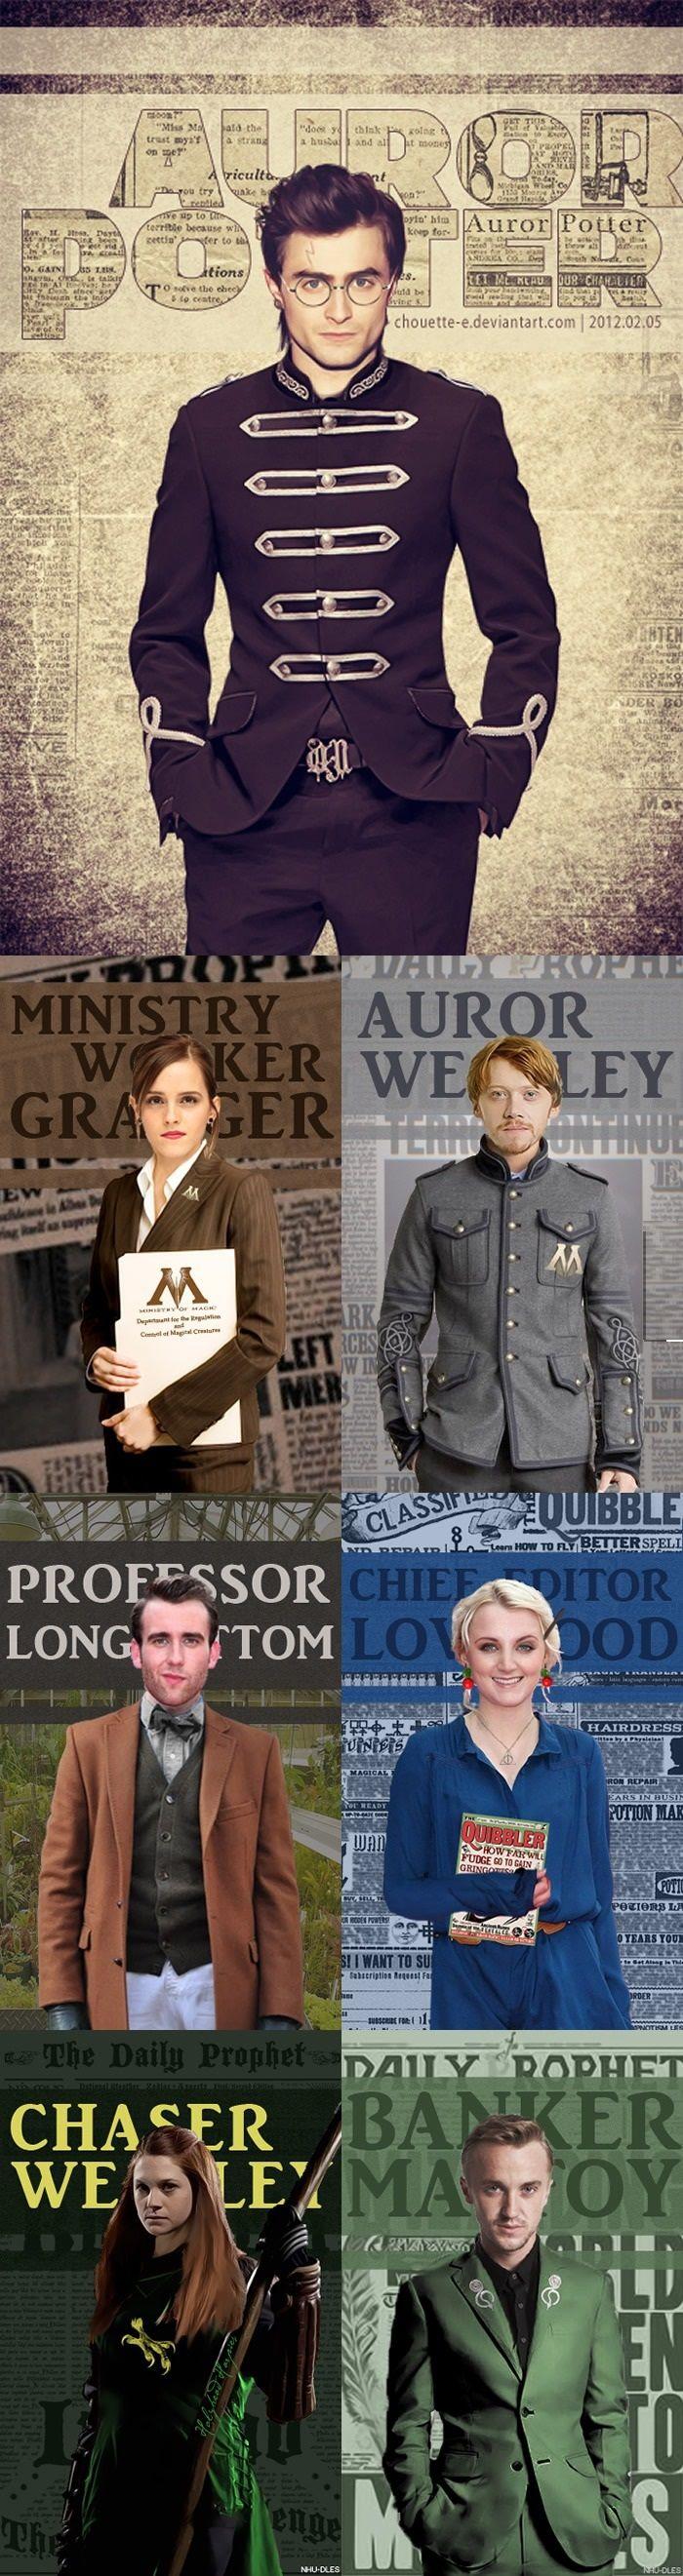 Auror Potter Ministey Worker Granger Auror Weasley Professor Longbottom Chief Editor Lovegood Harry Potter World Harry Potter Sammlung Harry Potter Lustig